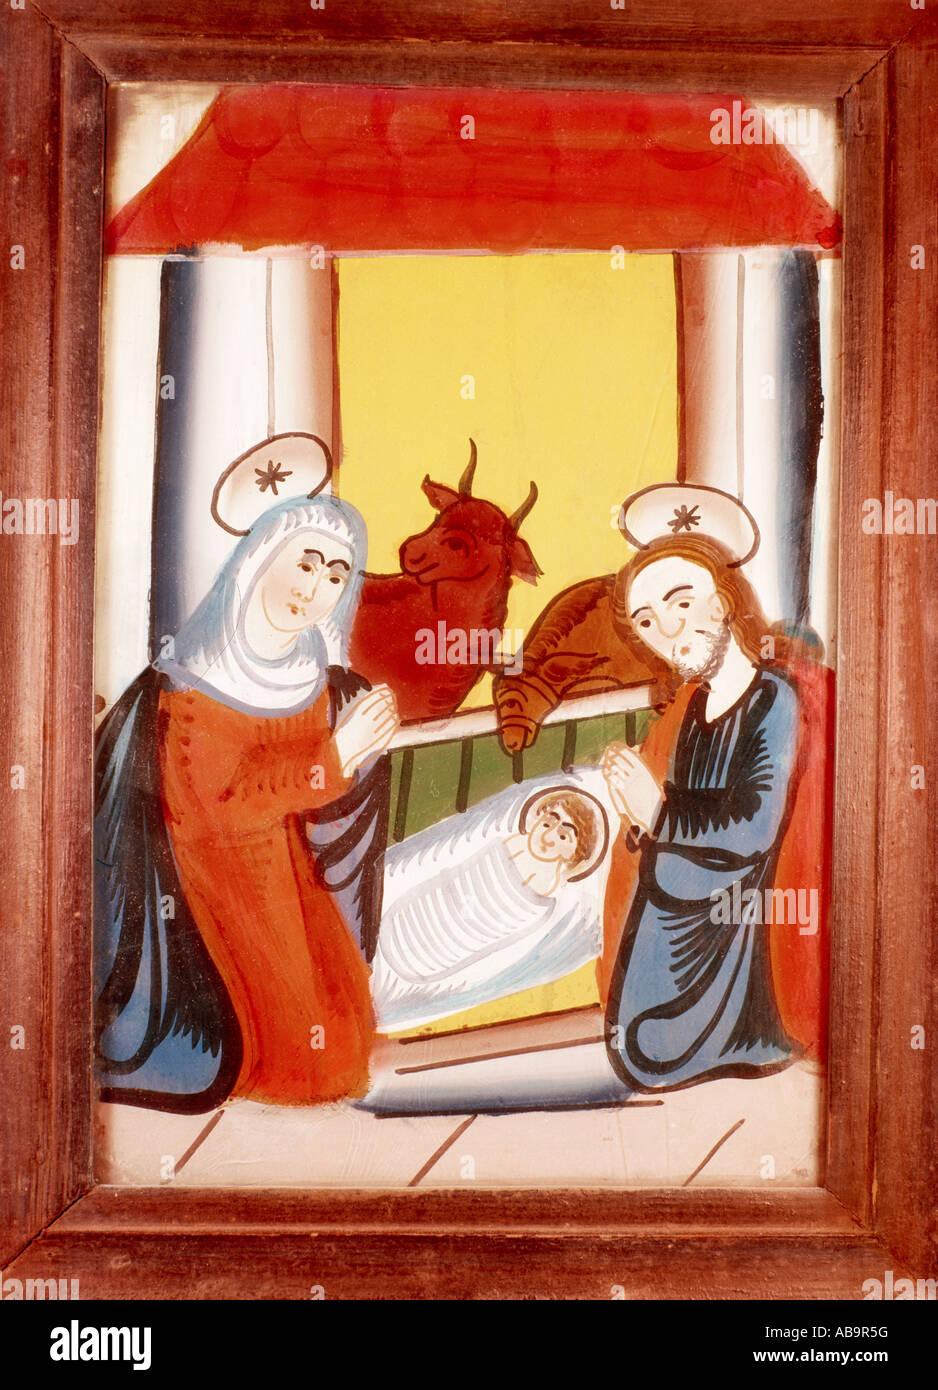 Bellas artes, arte religioso, Jesucristo, pesebres, vidrio pintado, Sandl, Alta Austria, a mediados del siglo XVIII, Imagen De Stock